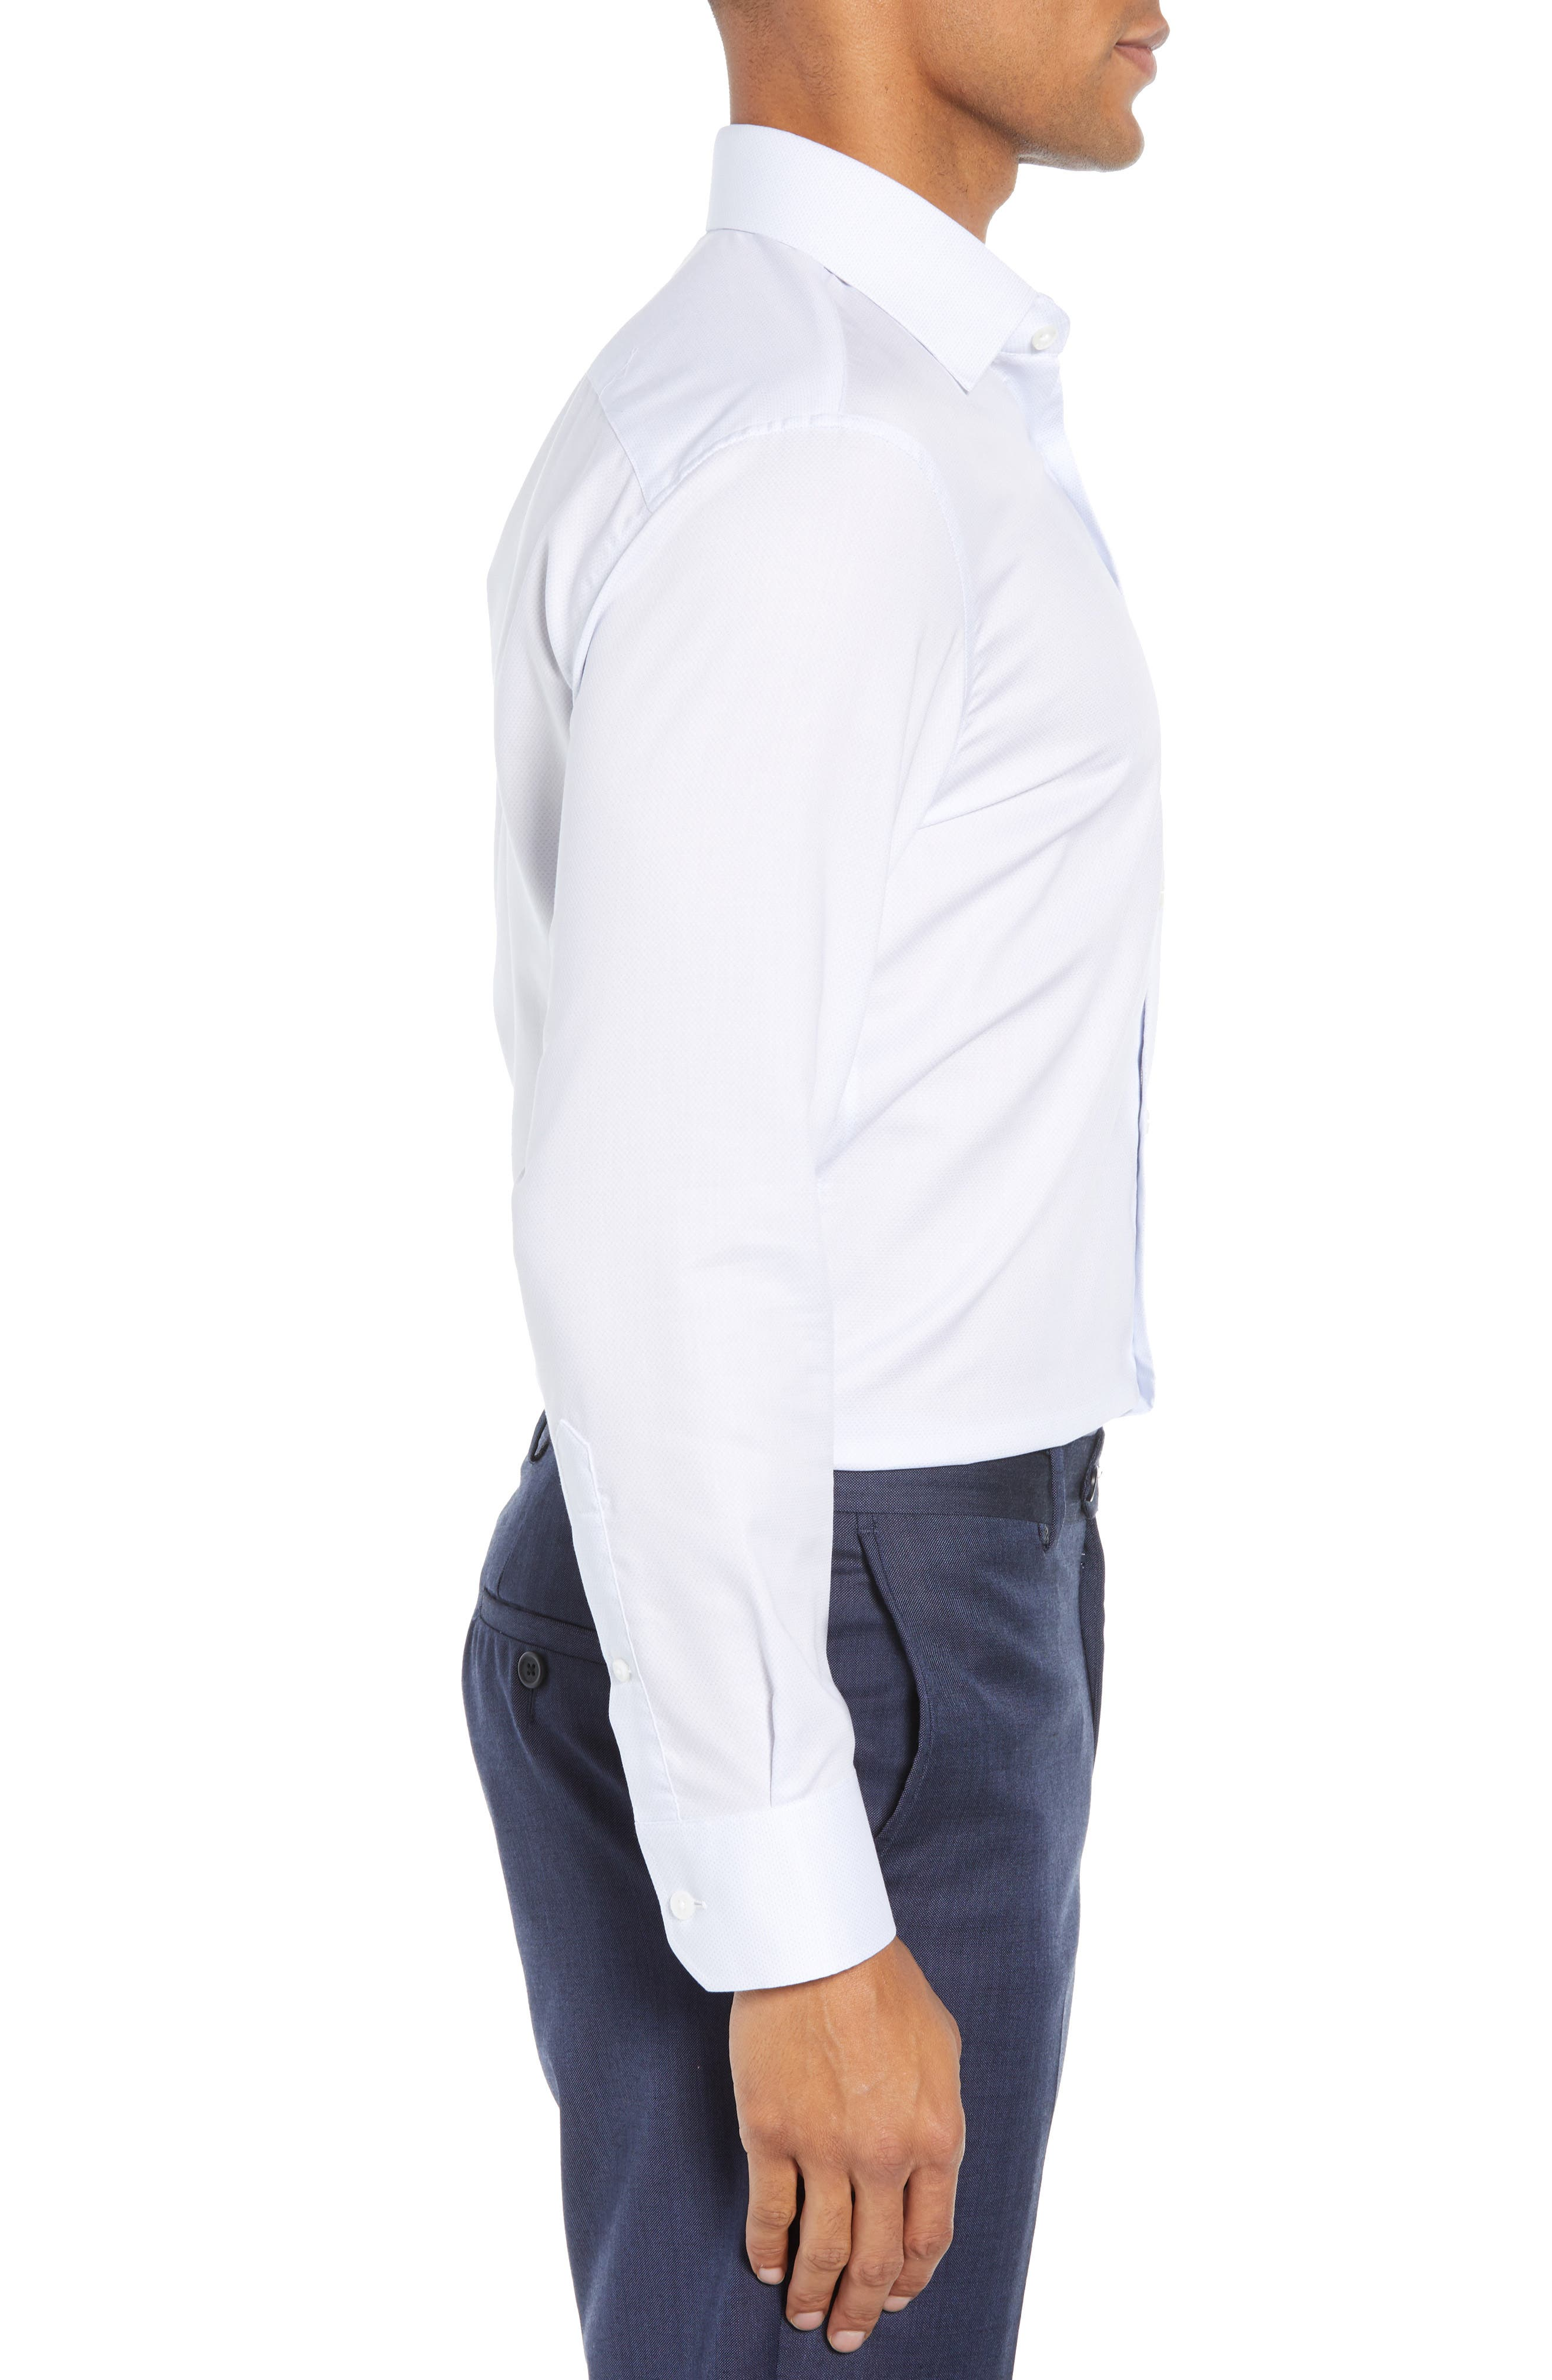 Swiss Performance Slim Fit Solid Dress Shirt,                             Alternate thumbnail 4, color,                             SOFT BLUE